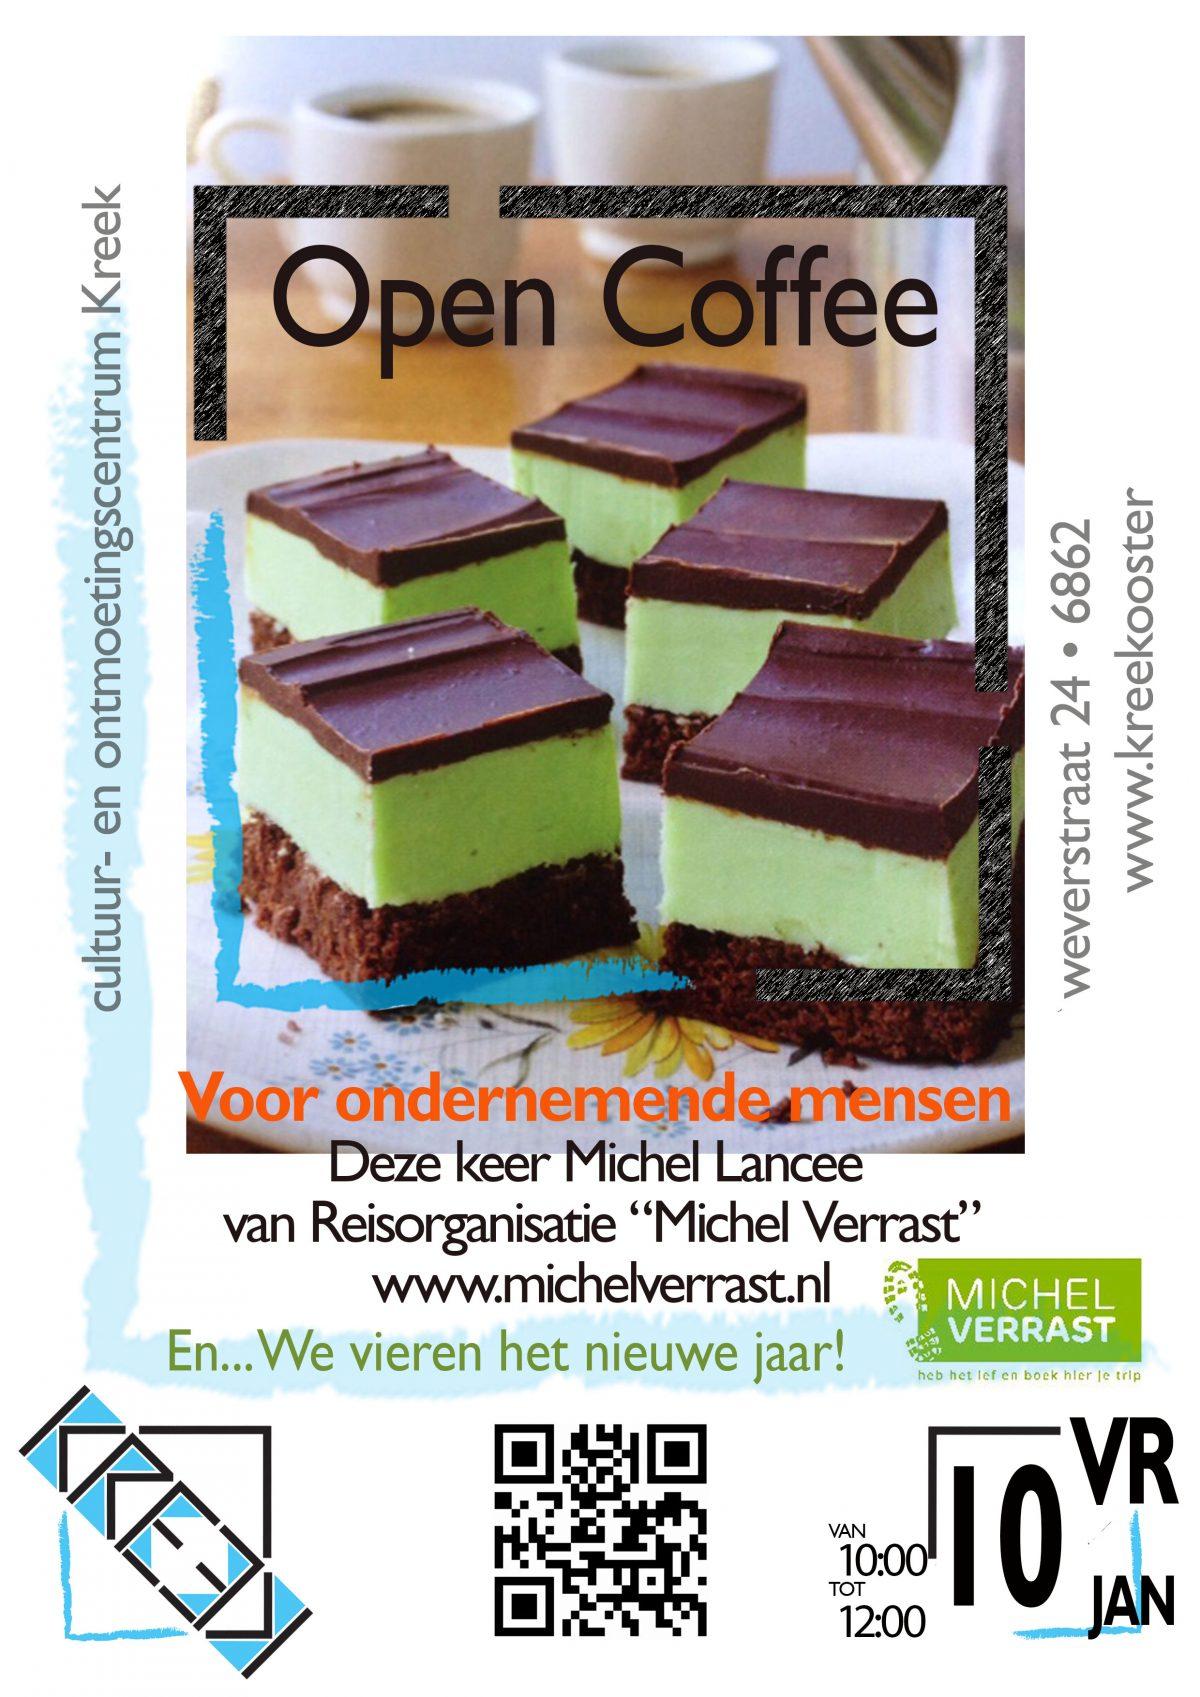 Uitnodiging Open Coffee 10 januari 2020 start 10 uur